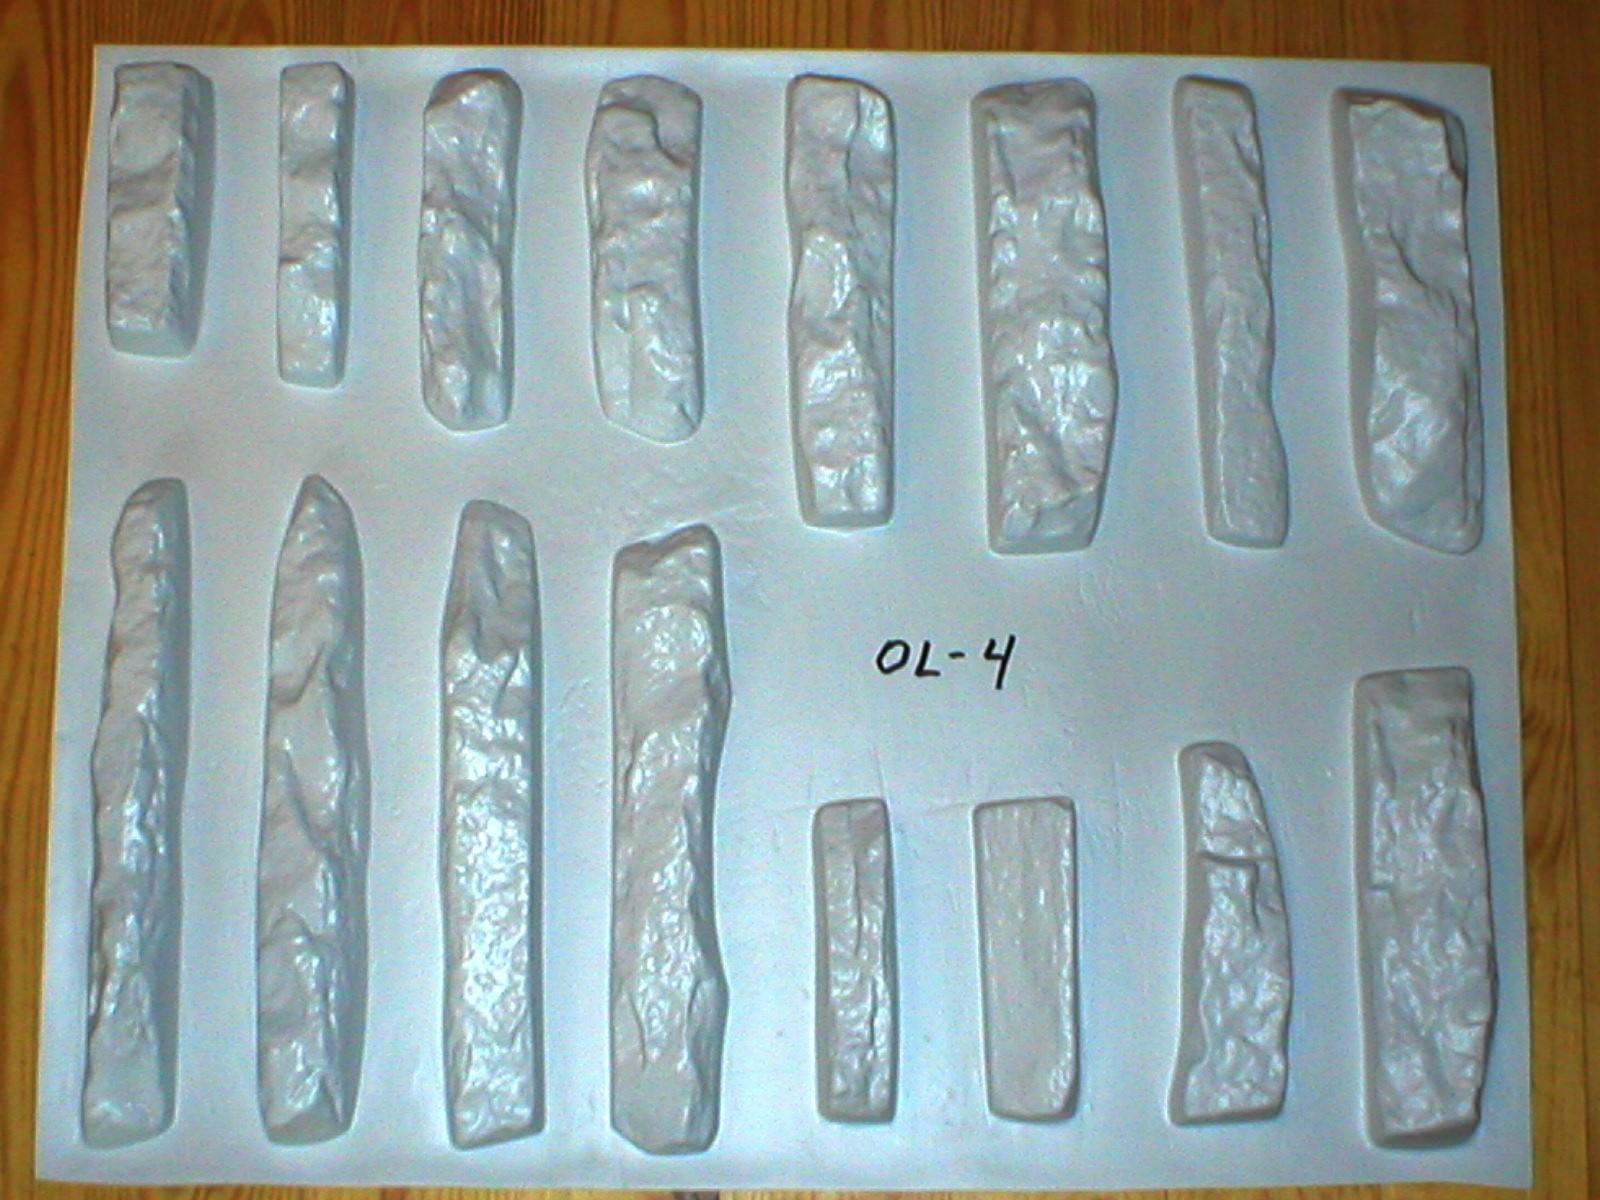 86 LEDGESTONE VENEER MOLDS MAKE TO 1000s OF INDIVIDUAL STONES FOR PENNIES EACH!